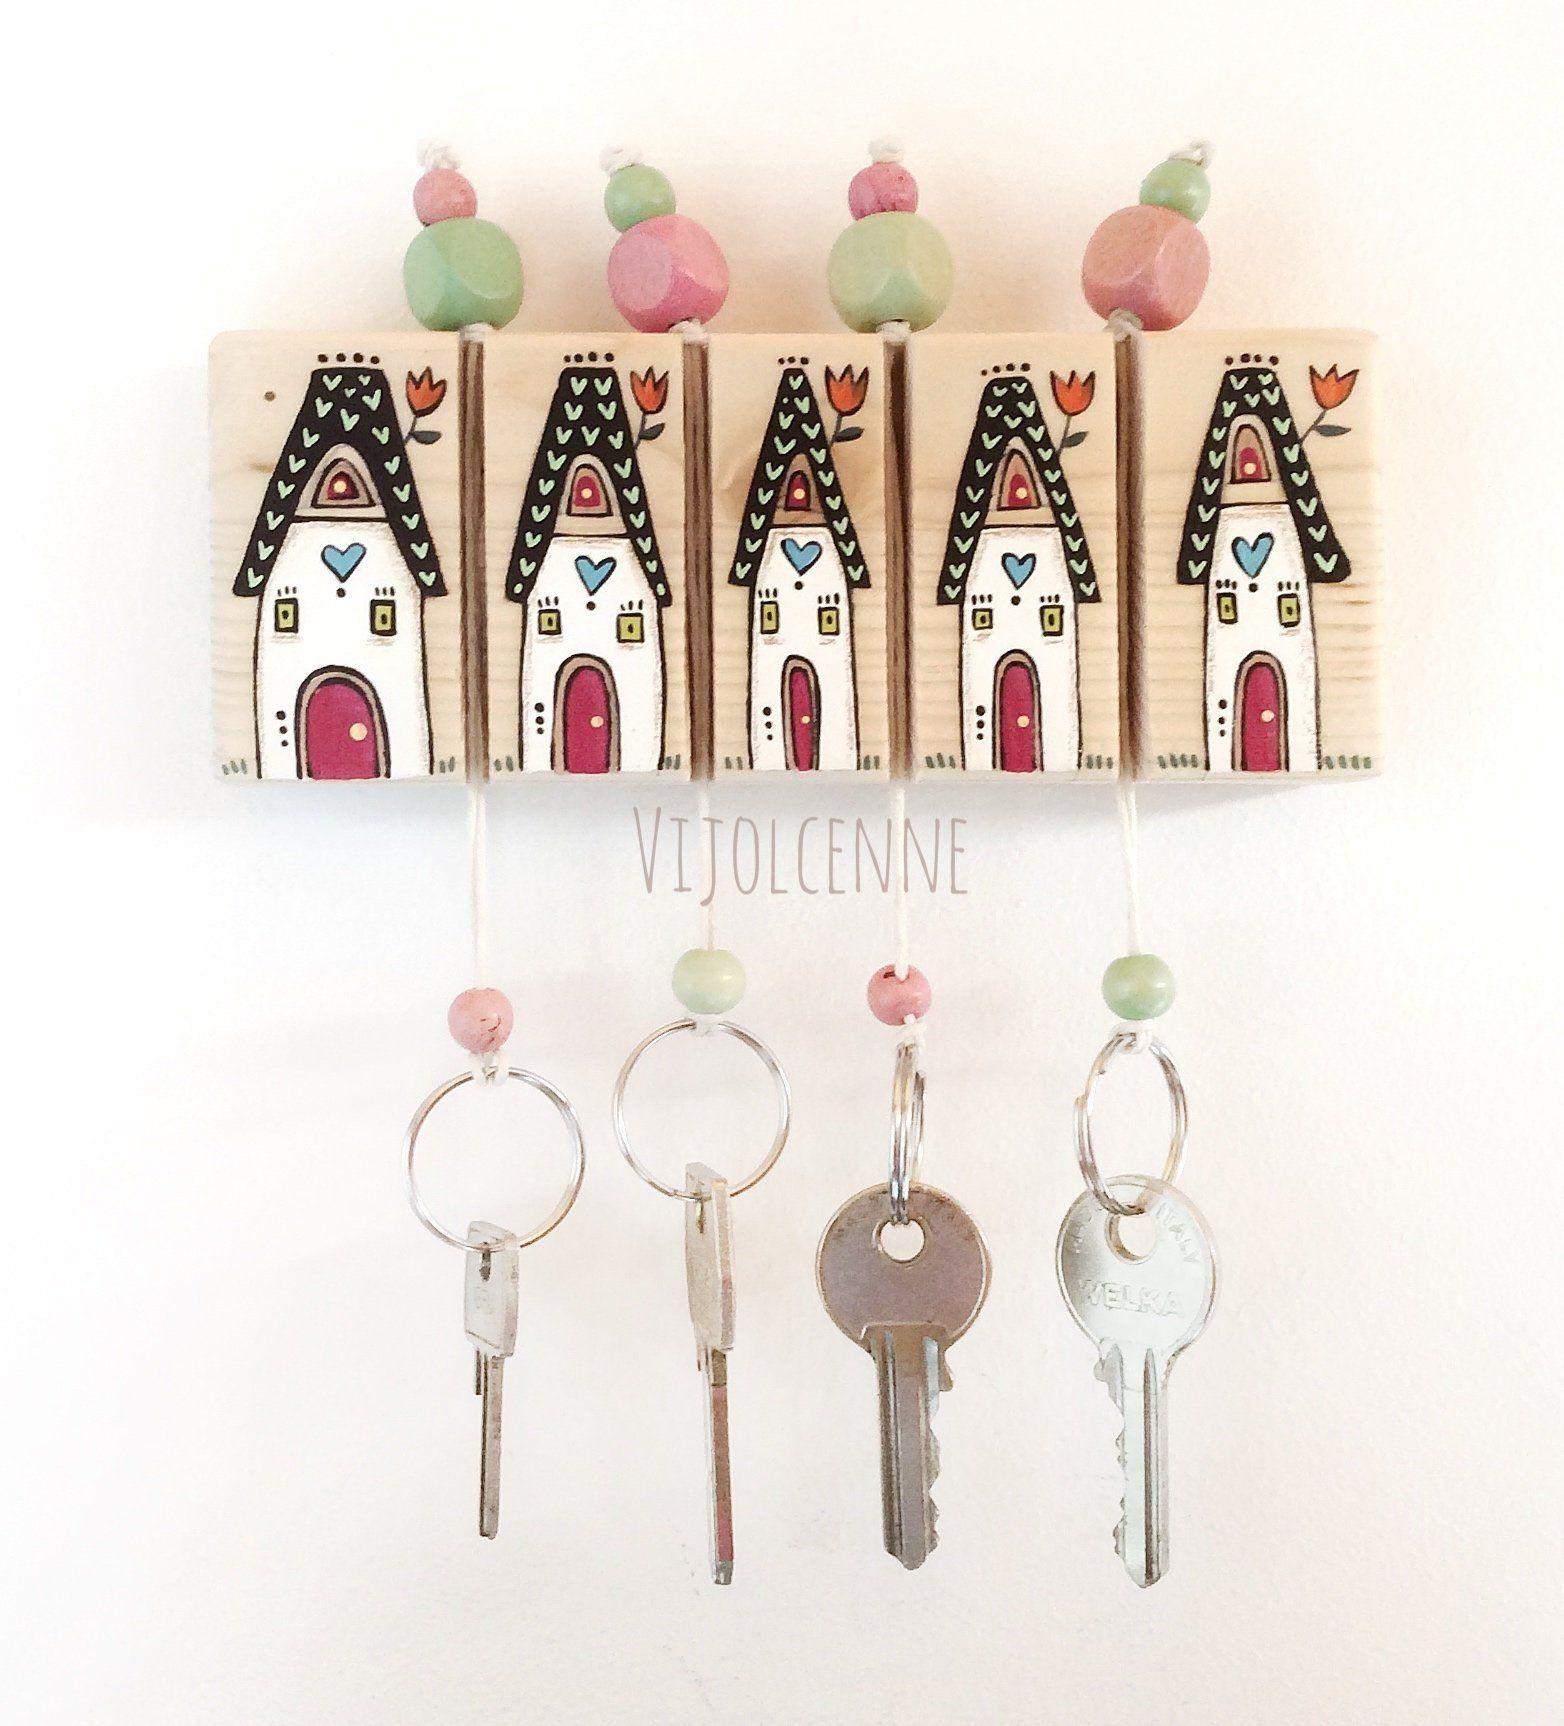 Key Holder Wall Hooks Wood Key Holder Wall Decor Wall Hanging Key Holder Artigianato In Pietra Parete Artigianato